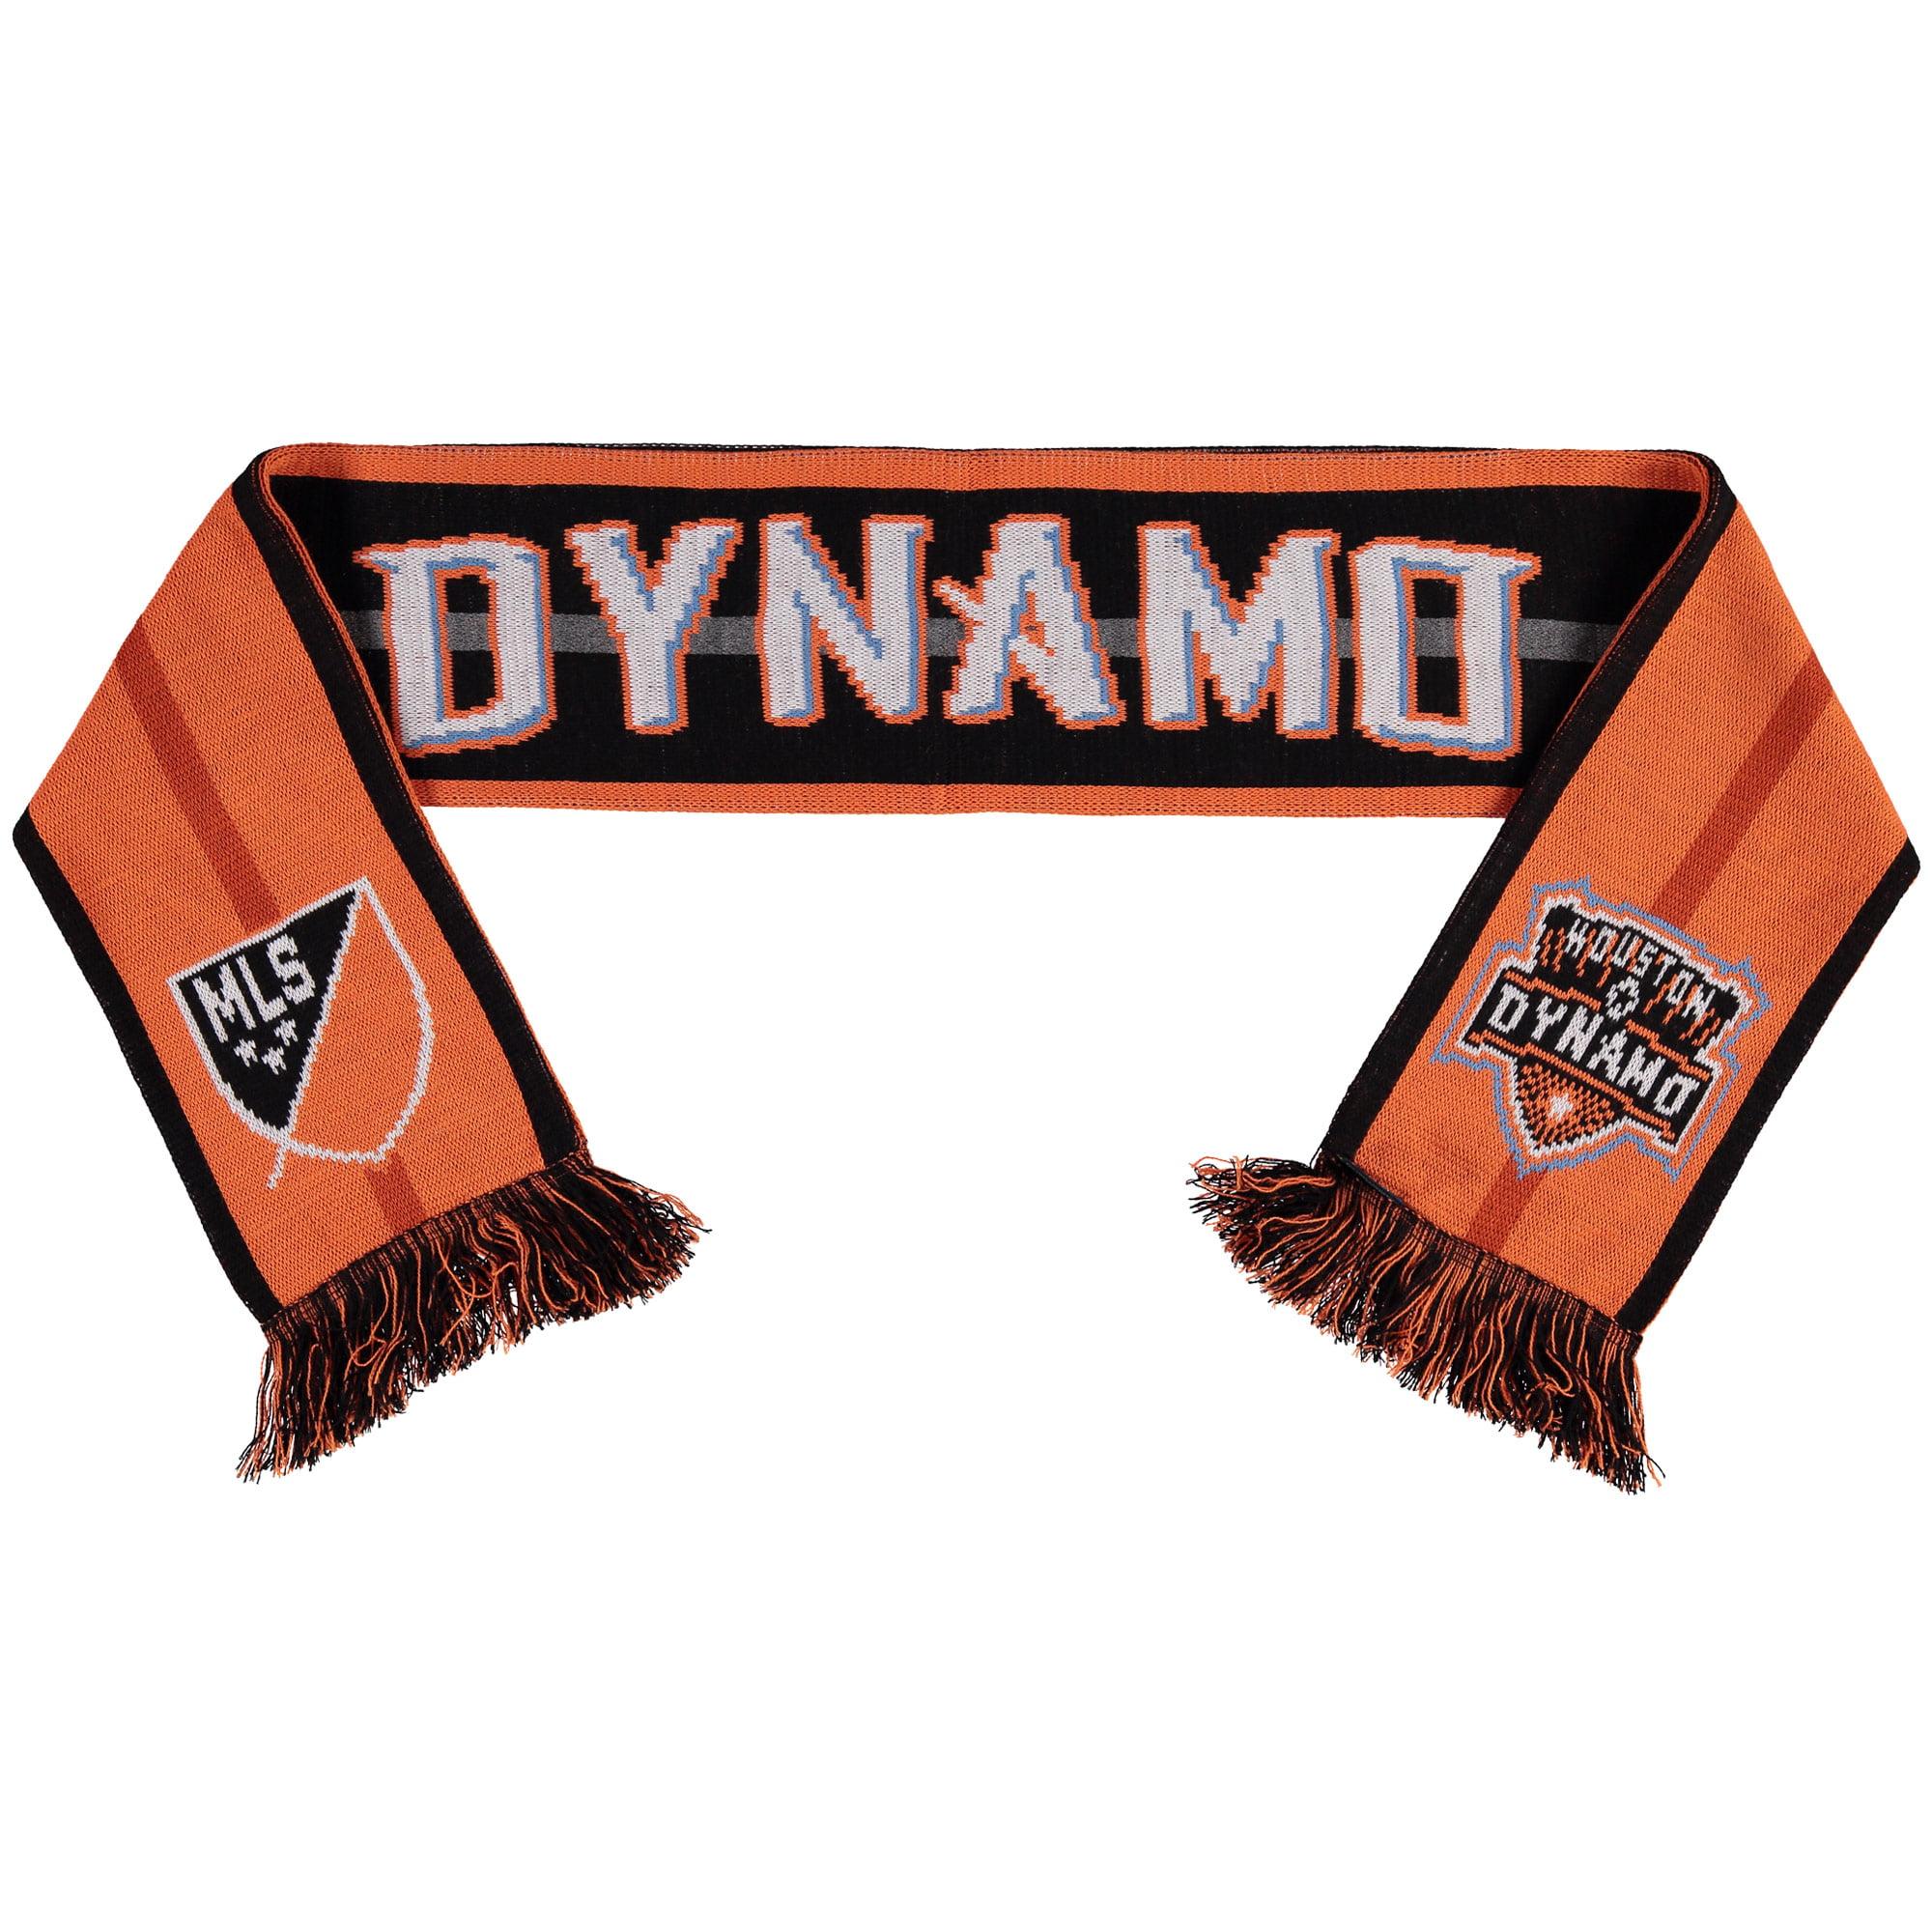 Houston Dynamo Team Pride Scarf - Orange/Black - No Size